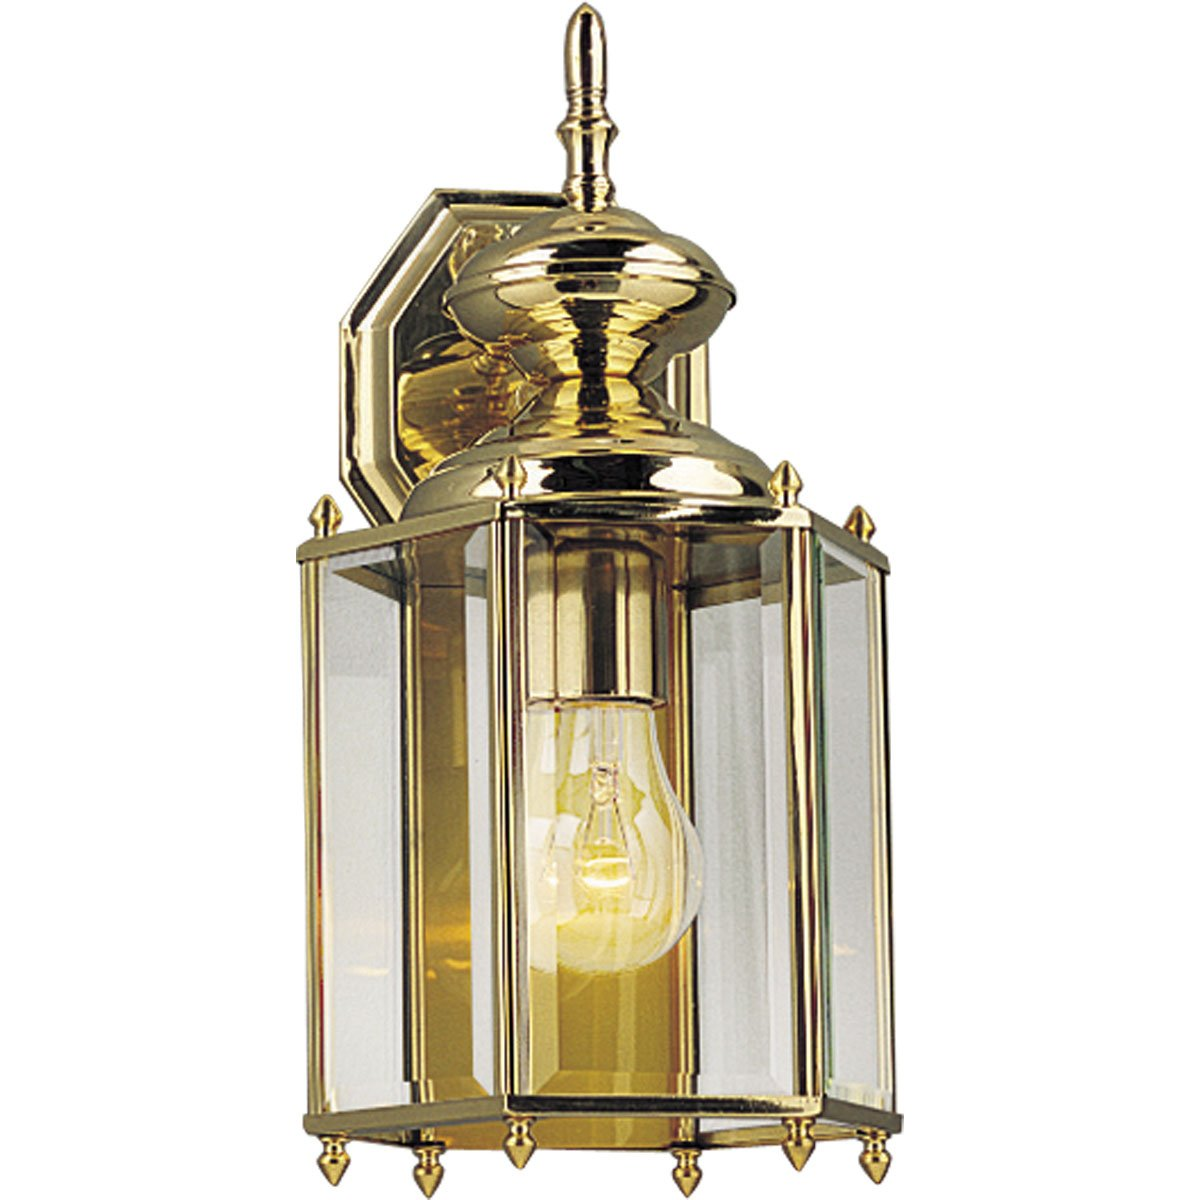 Progress Lighting P5832-10 Weathered Solid Brass Hexagonal Wall Lantern with Beveled Glass, Polished Brass